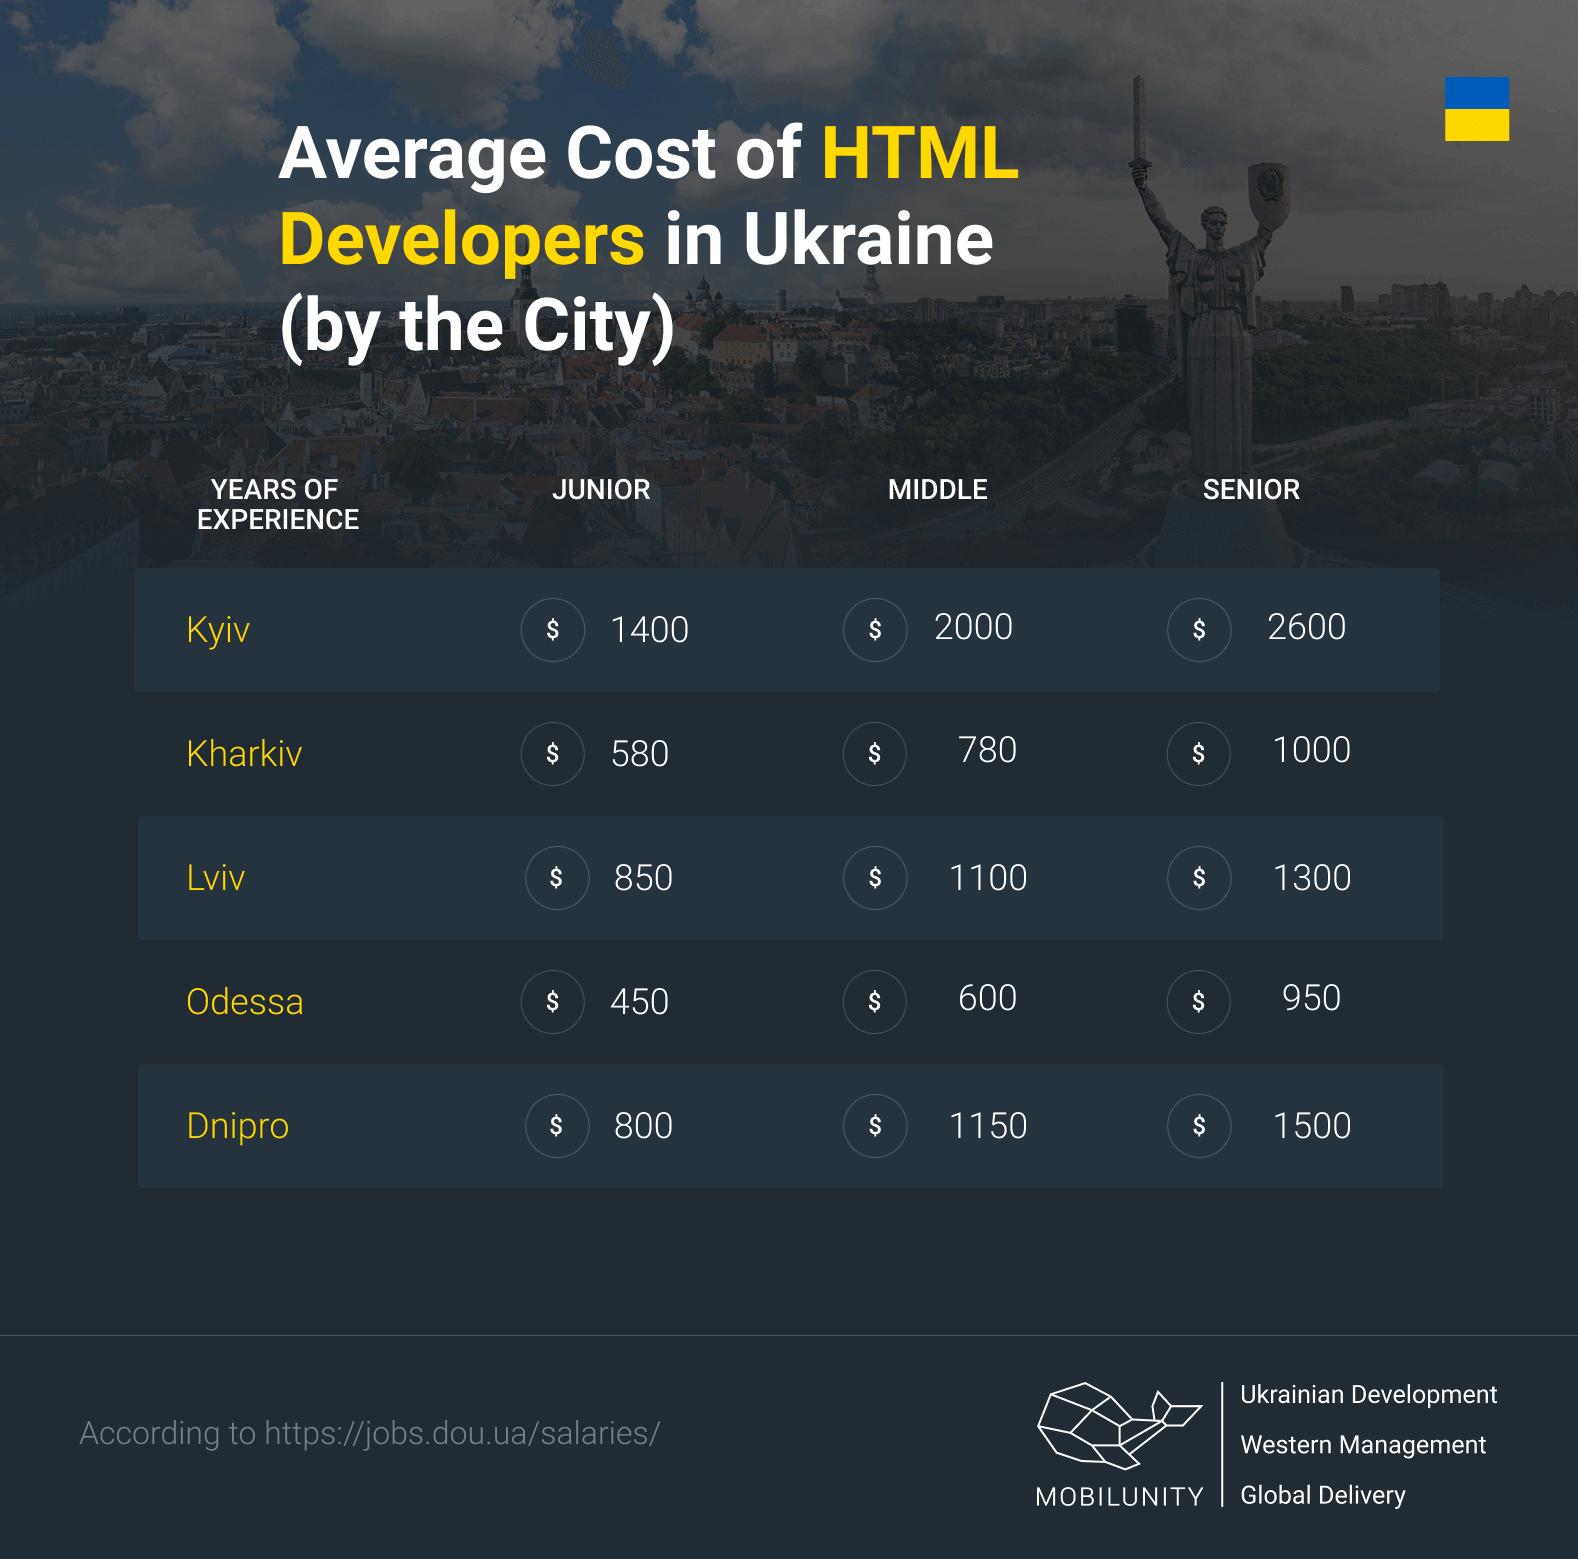 ost of HTML coder in Ukraine